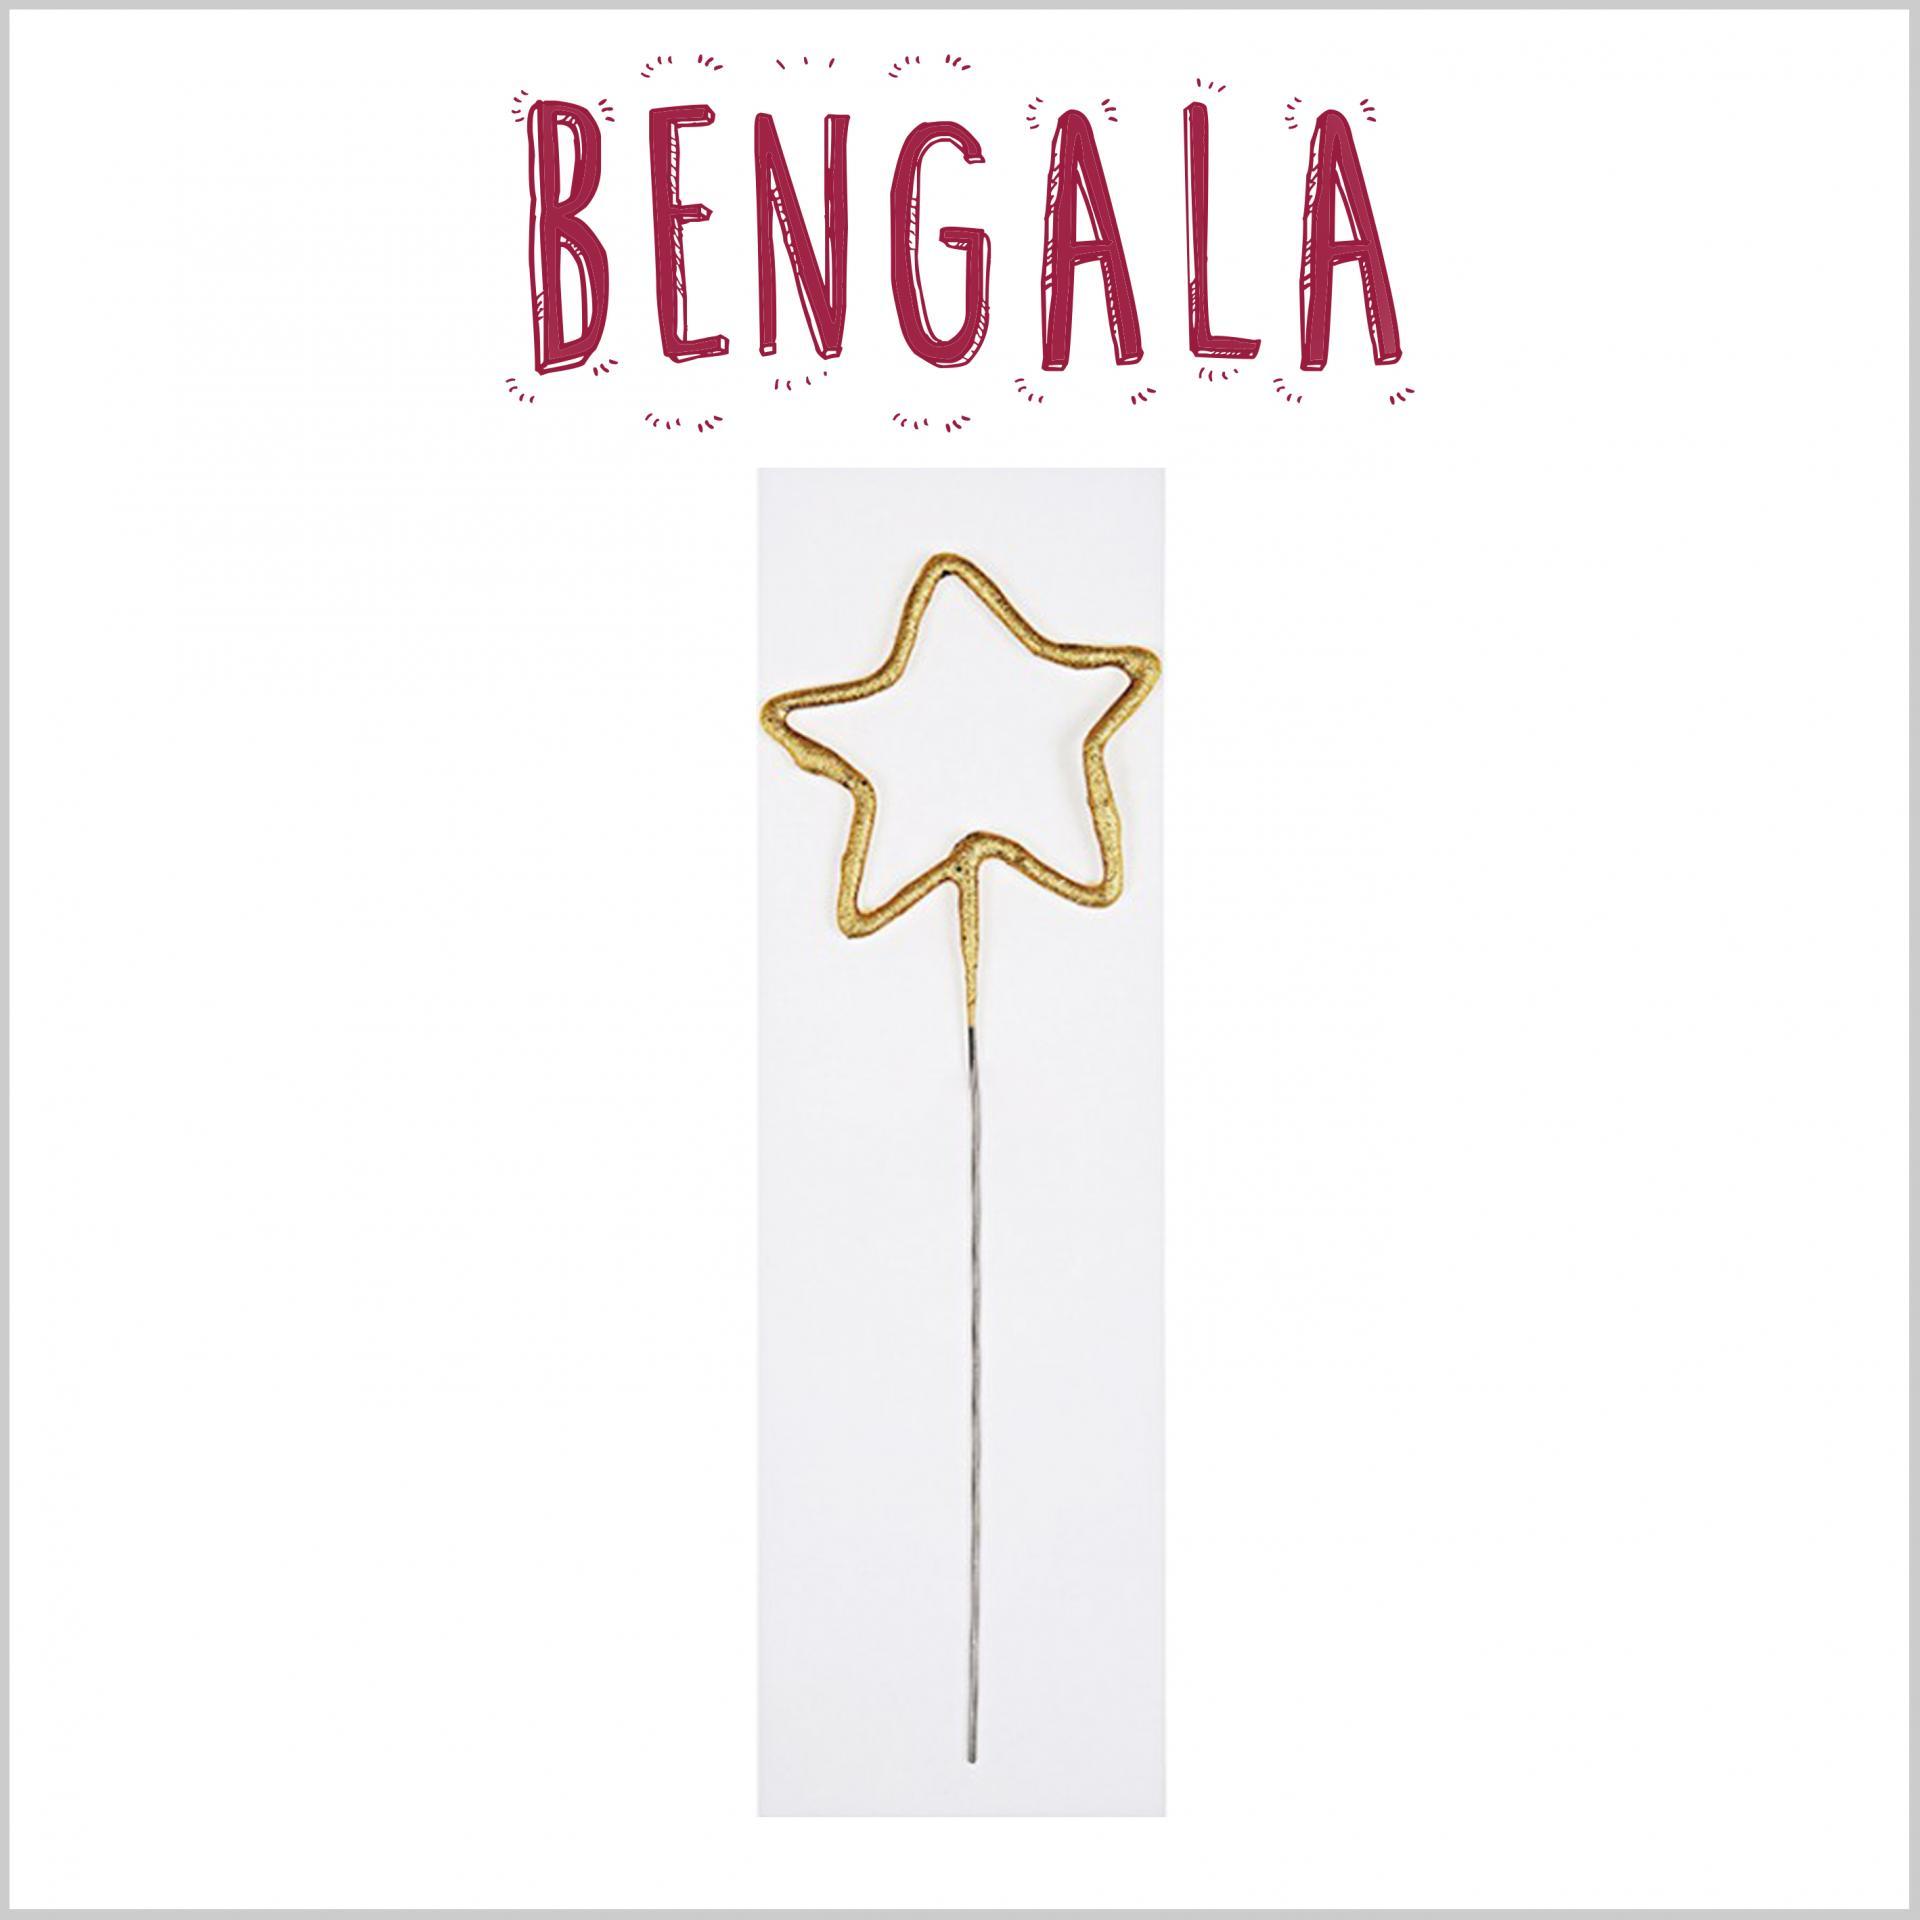 Bengala Meri Meri Estrella